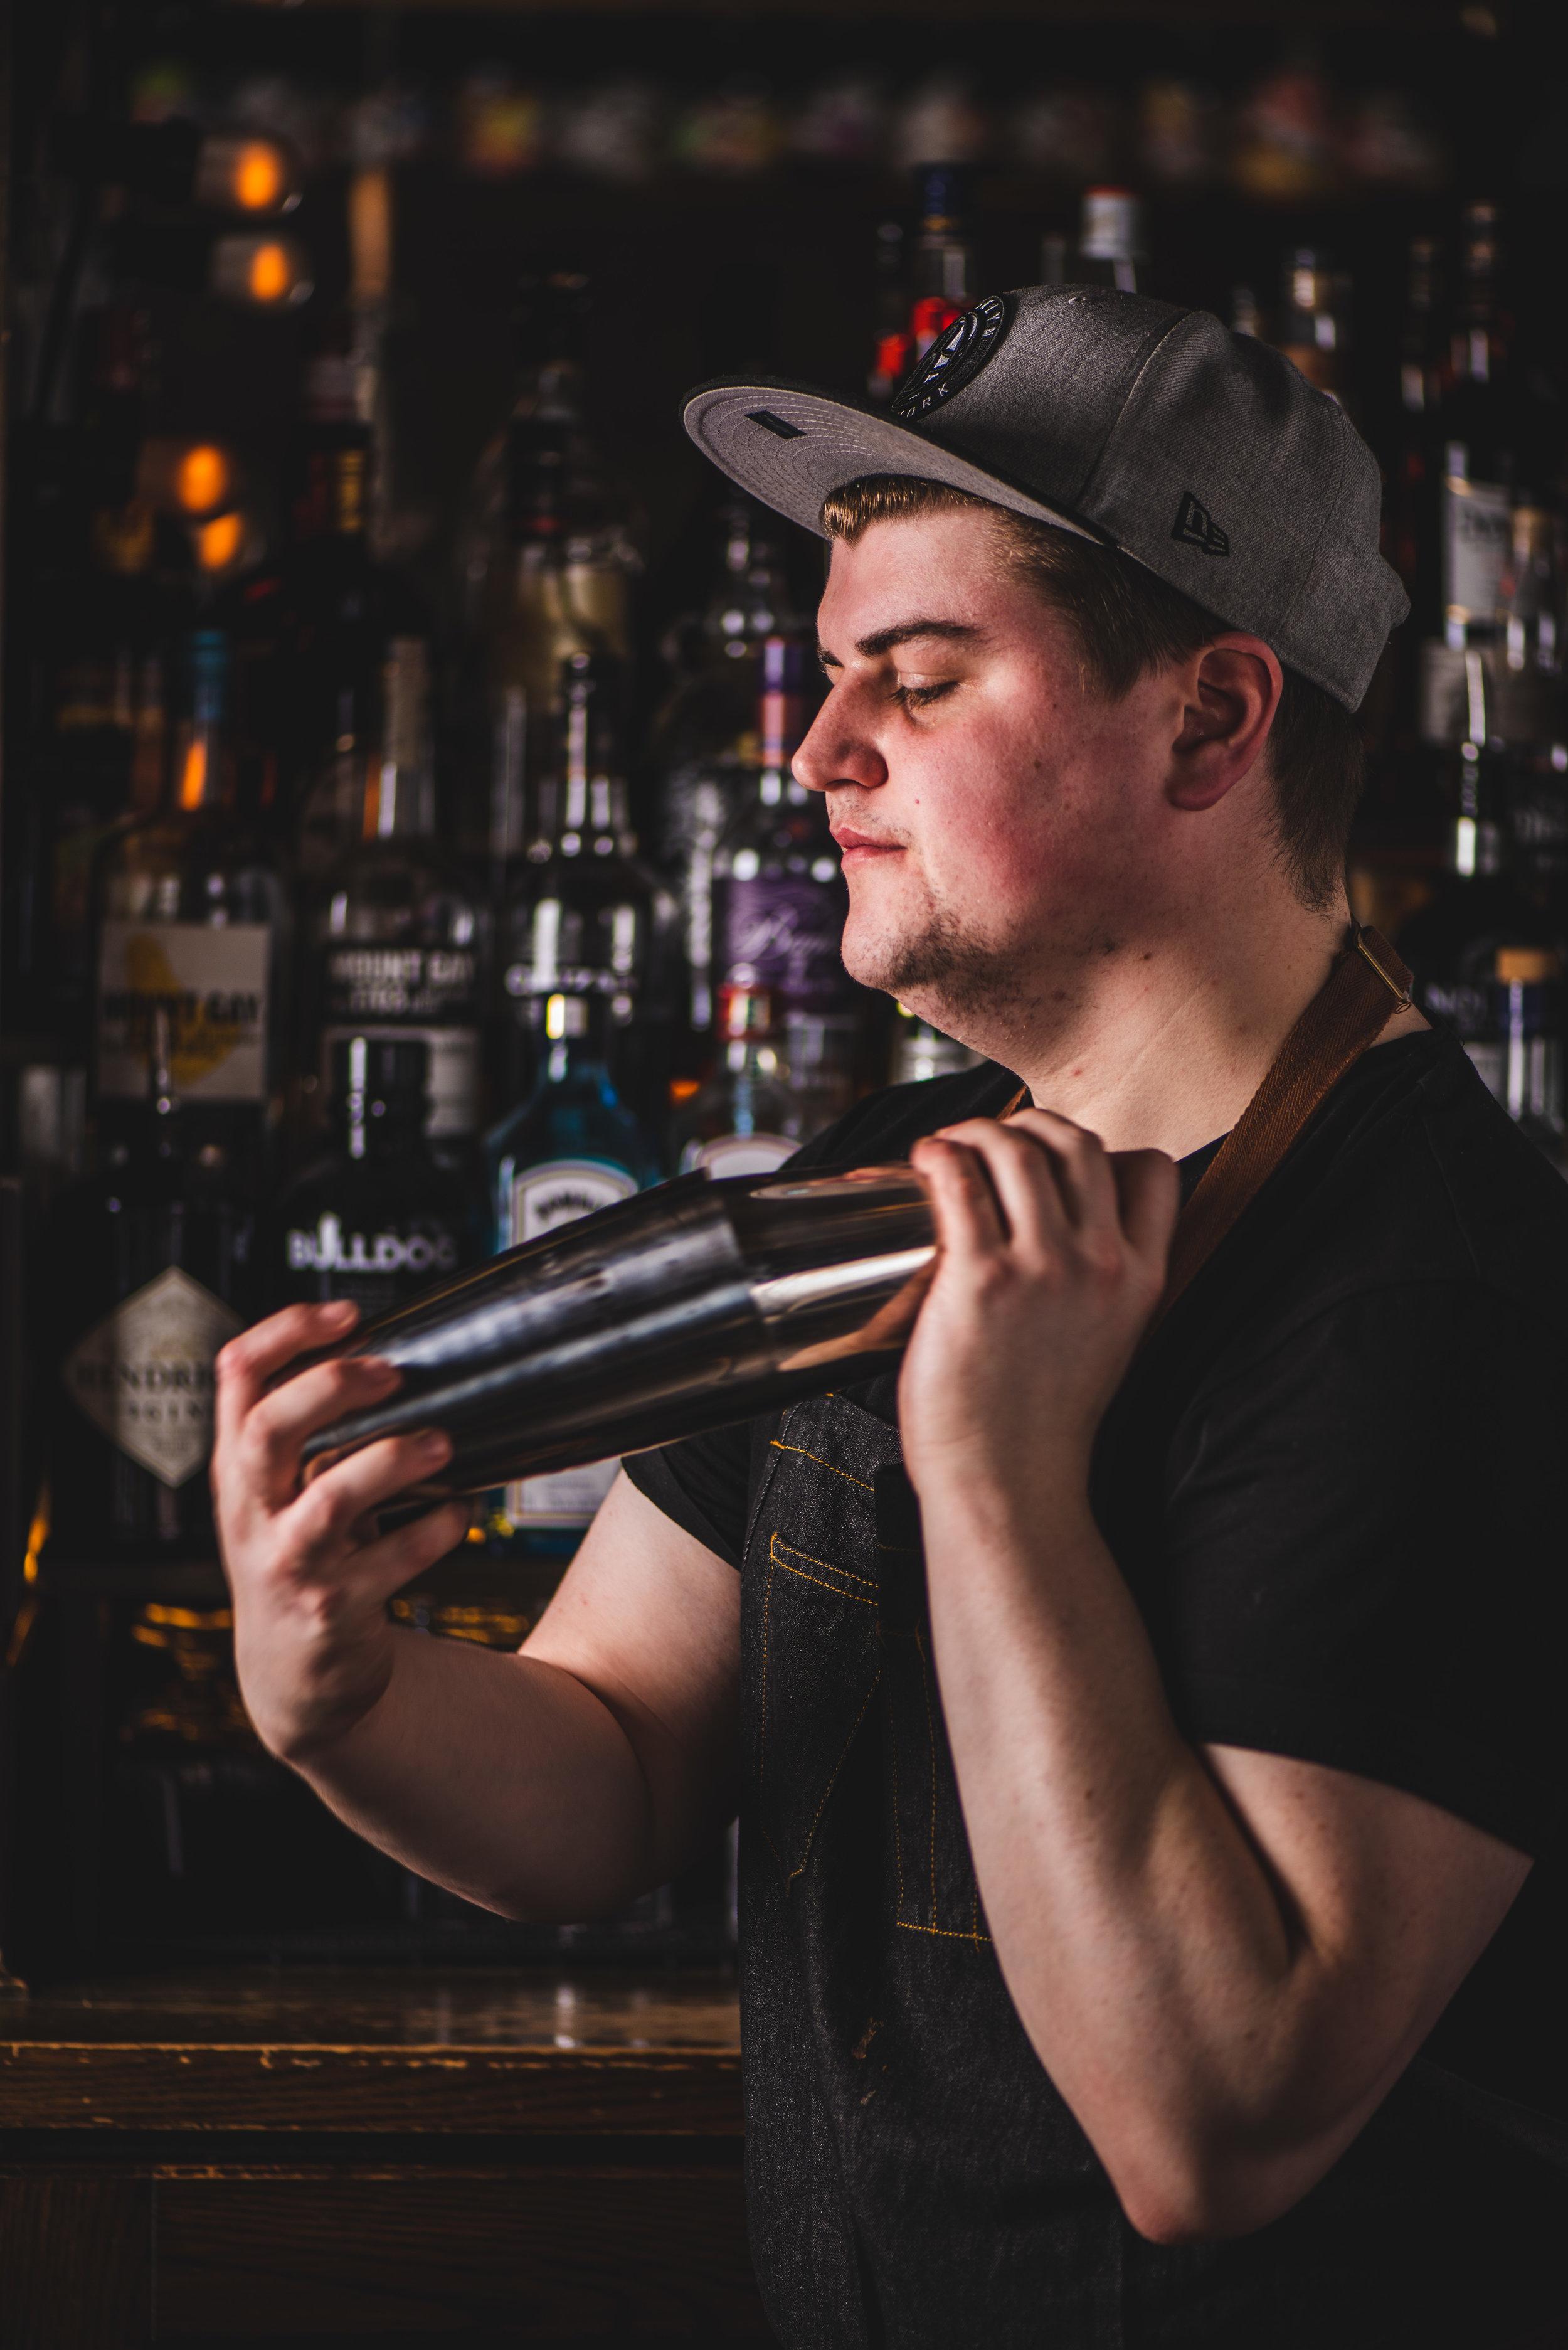 Bartender / Creative Director, Conor Myers (Courtesy of Underdog)